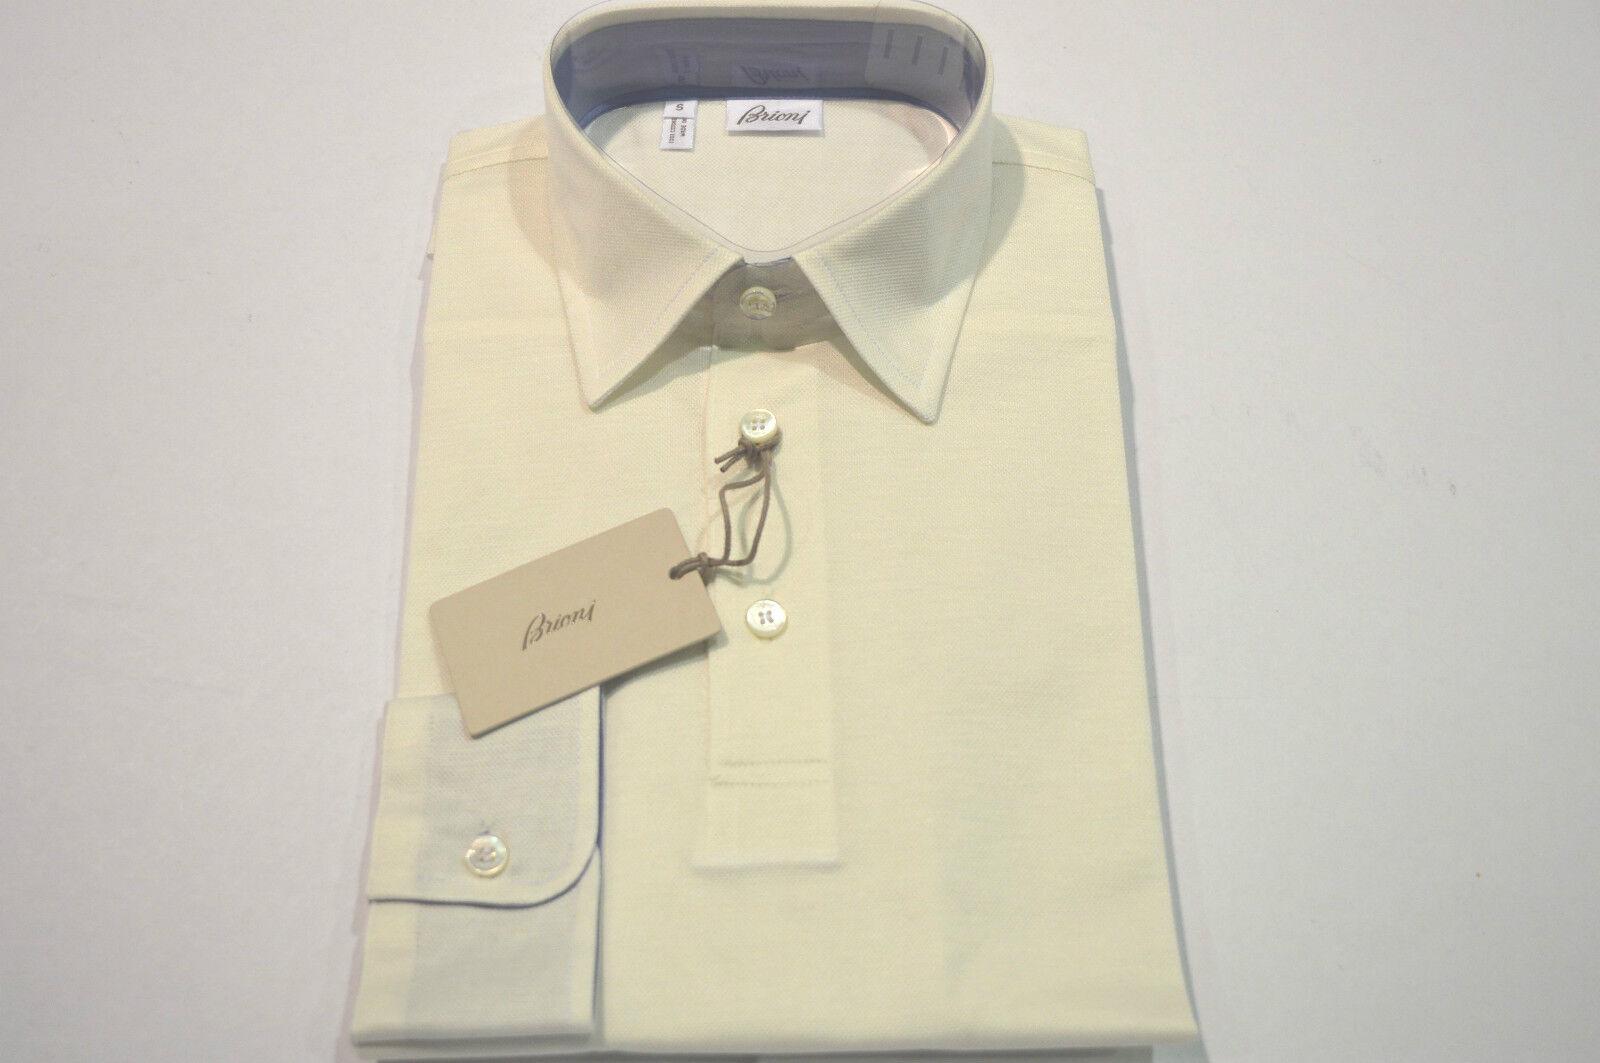 NEW BRIONI  Polo 100% Cotton  Long sleeve  Größe S Us 48 Eu (Cod B)